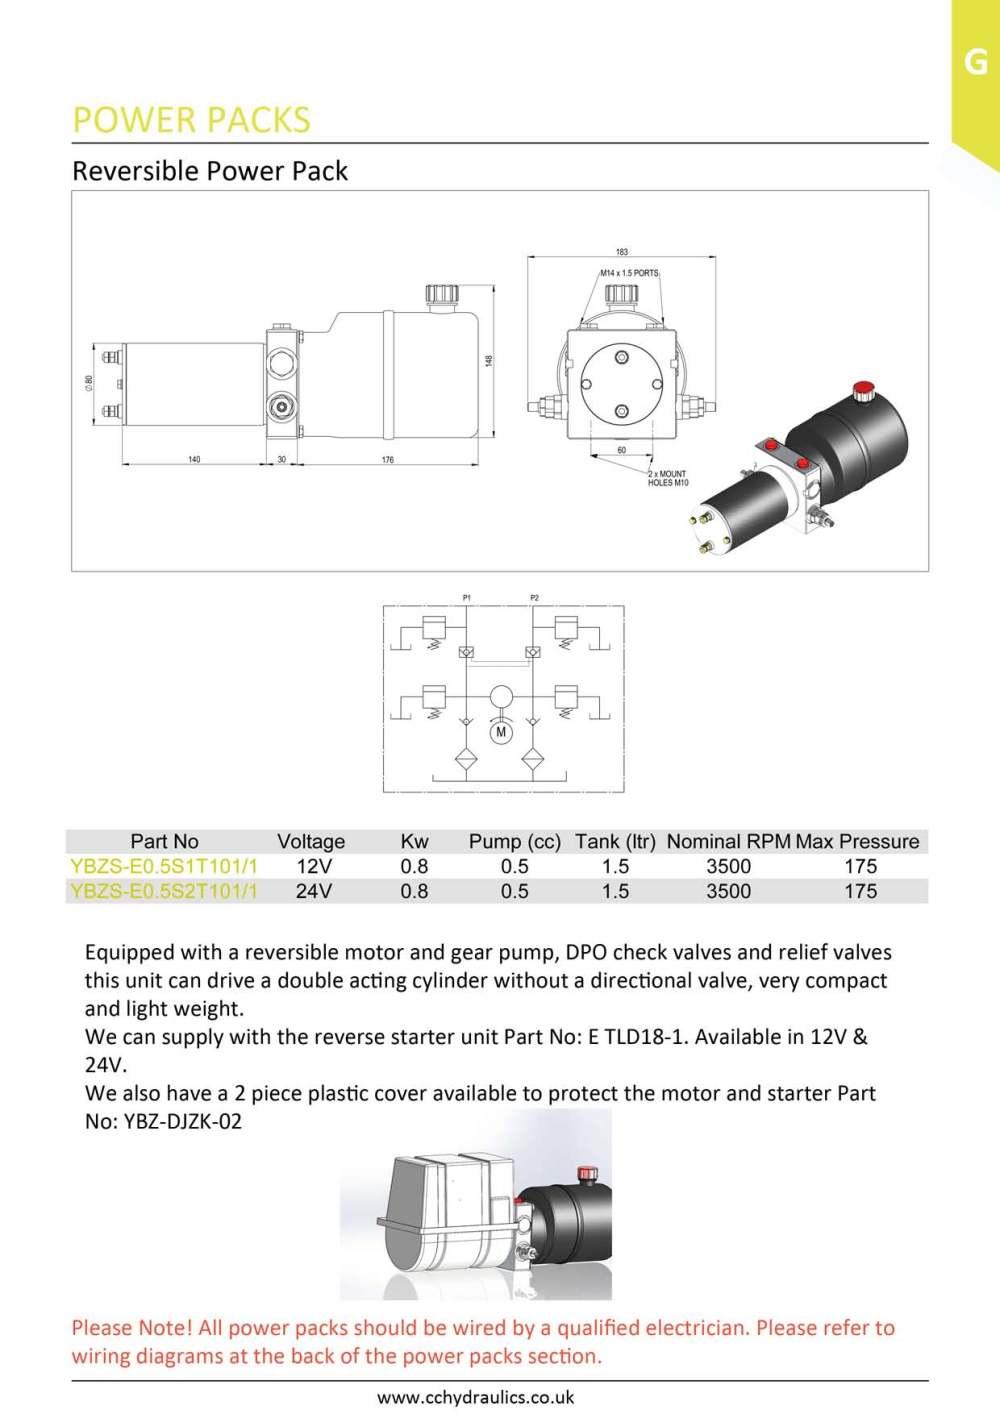 medium resolution of reversible power pack